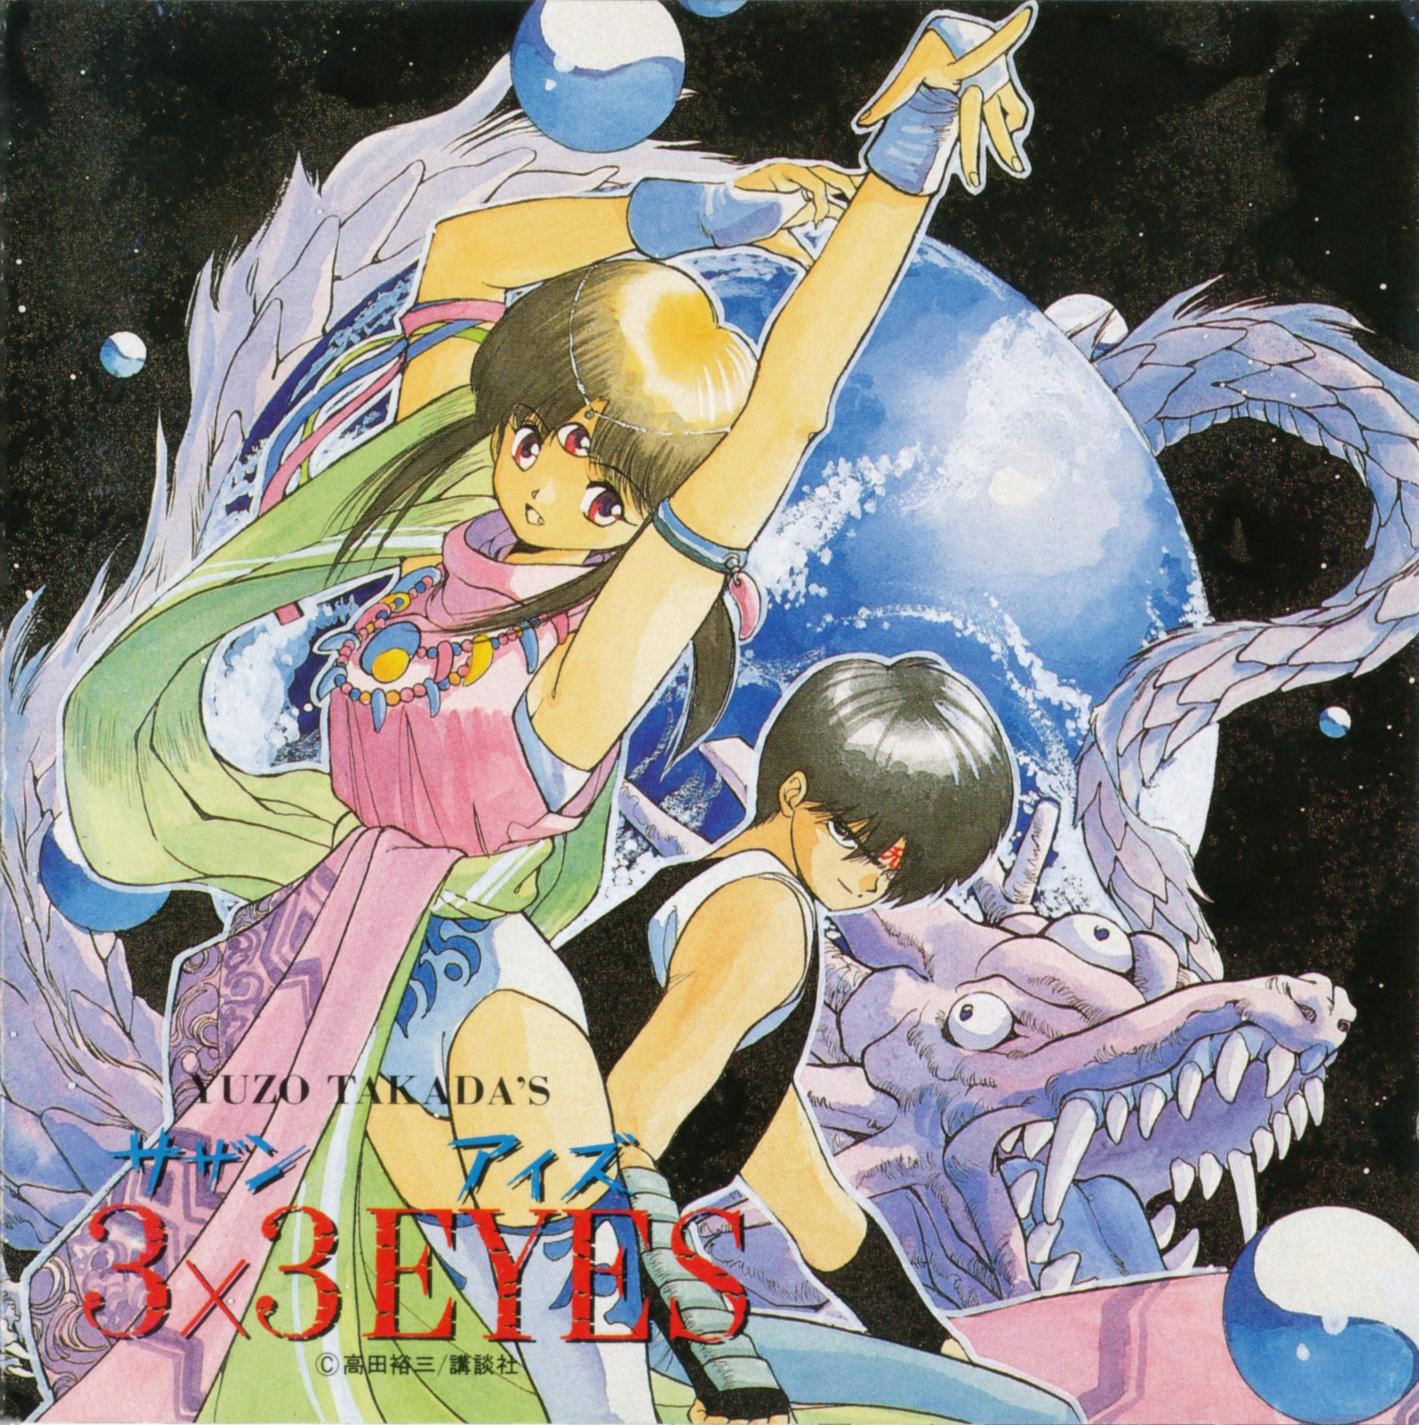 3x3 EYES -Mankind Volume-. Soundtrack From 3x3 EYES